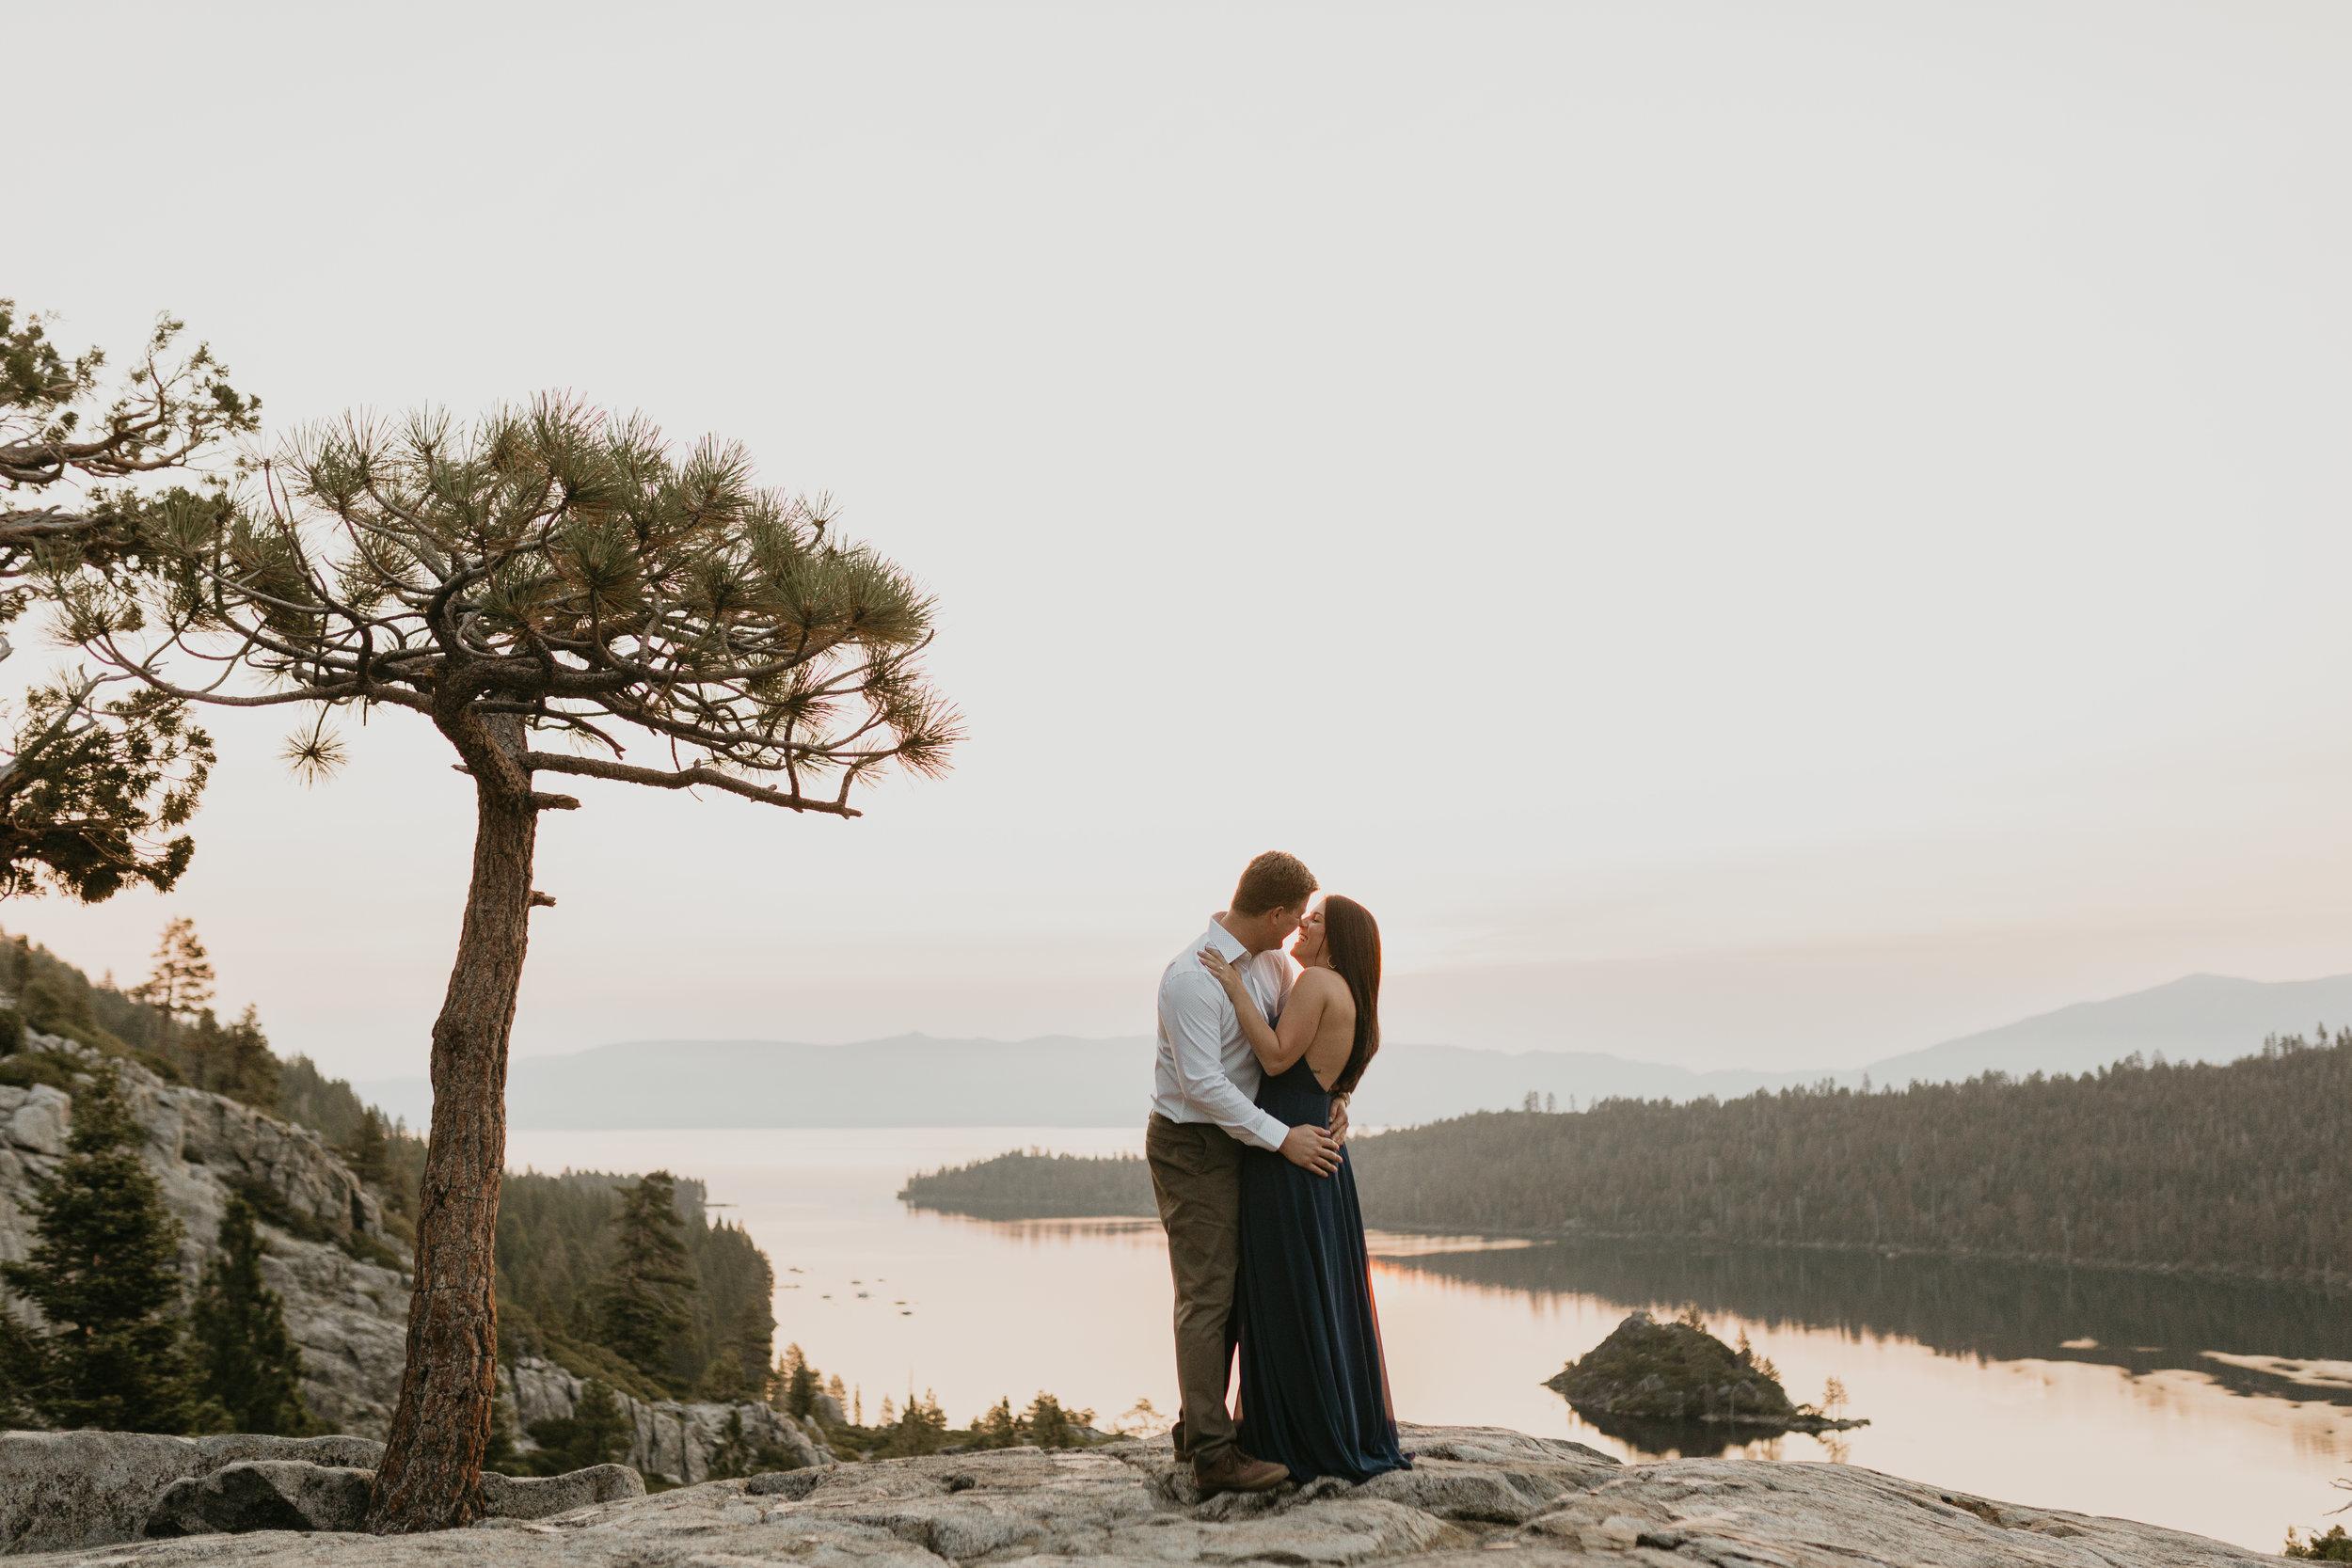 nicole-daacke-photography-lake-tahoe-sunrise-summer-adventure-engagement-photos-nevada-wedding-elopement-photographer-golden-emerald-bay-light-pine-trees-summer-vibe-fun-carefree-authentic-love-12.jpg